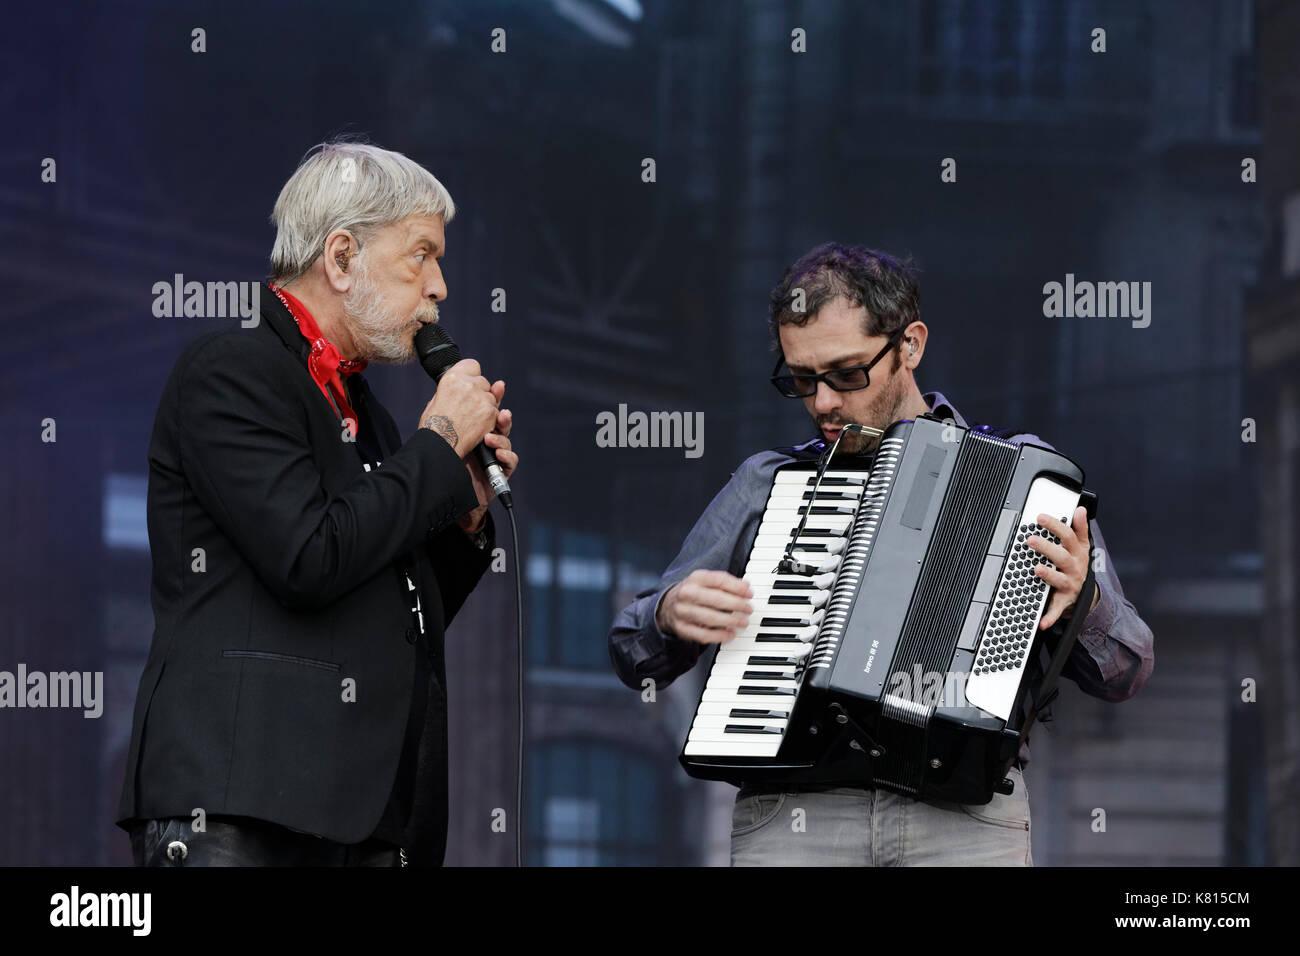 La Courneuve, France. 17th Sep, 2017. Renaud Sechan performs at the Fête de l'humanité, on September 17, 2017 in La Courneuve. Credit: Bernard Menigault/Alamy Live News - Stock Image